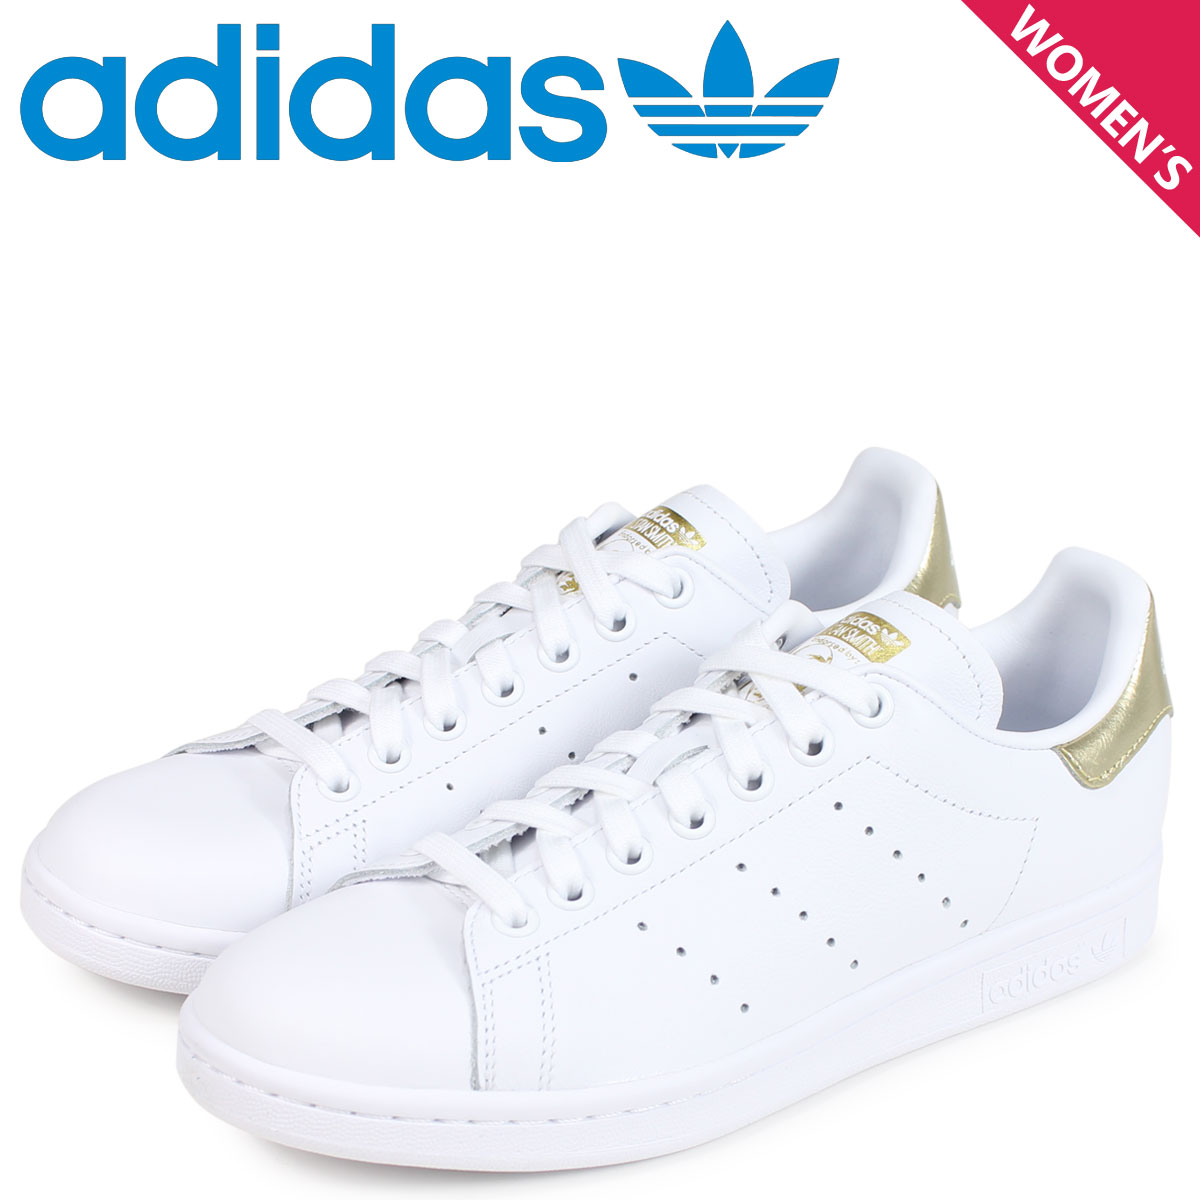 adidas Originals アディダス オリジナルス スタンスミス スニーカー レディース STAN SMITH W ホワイト 白 EE8836